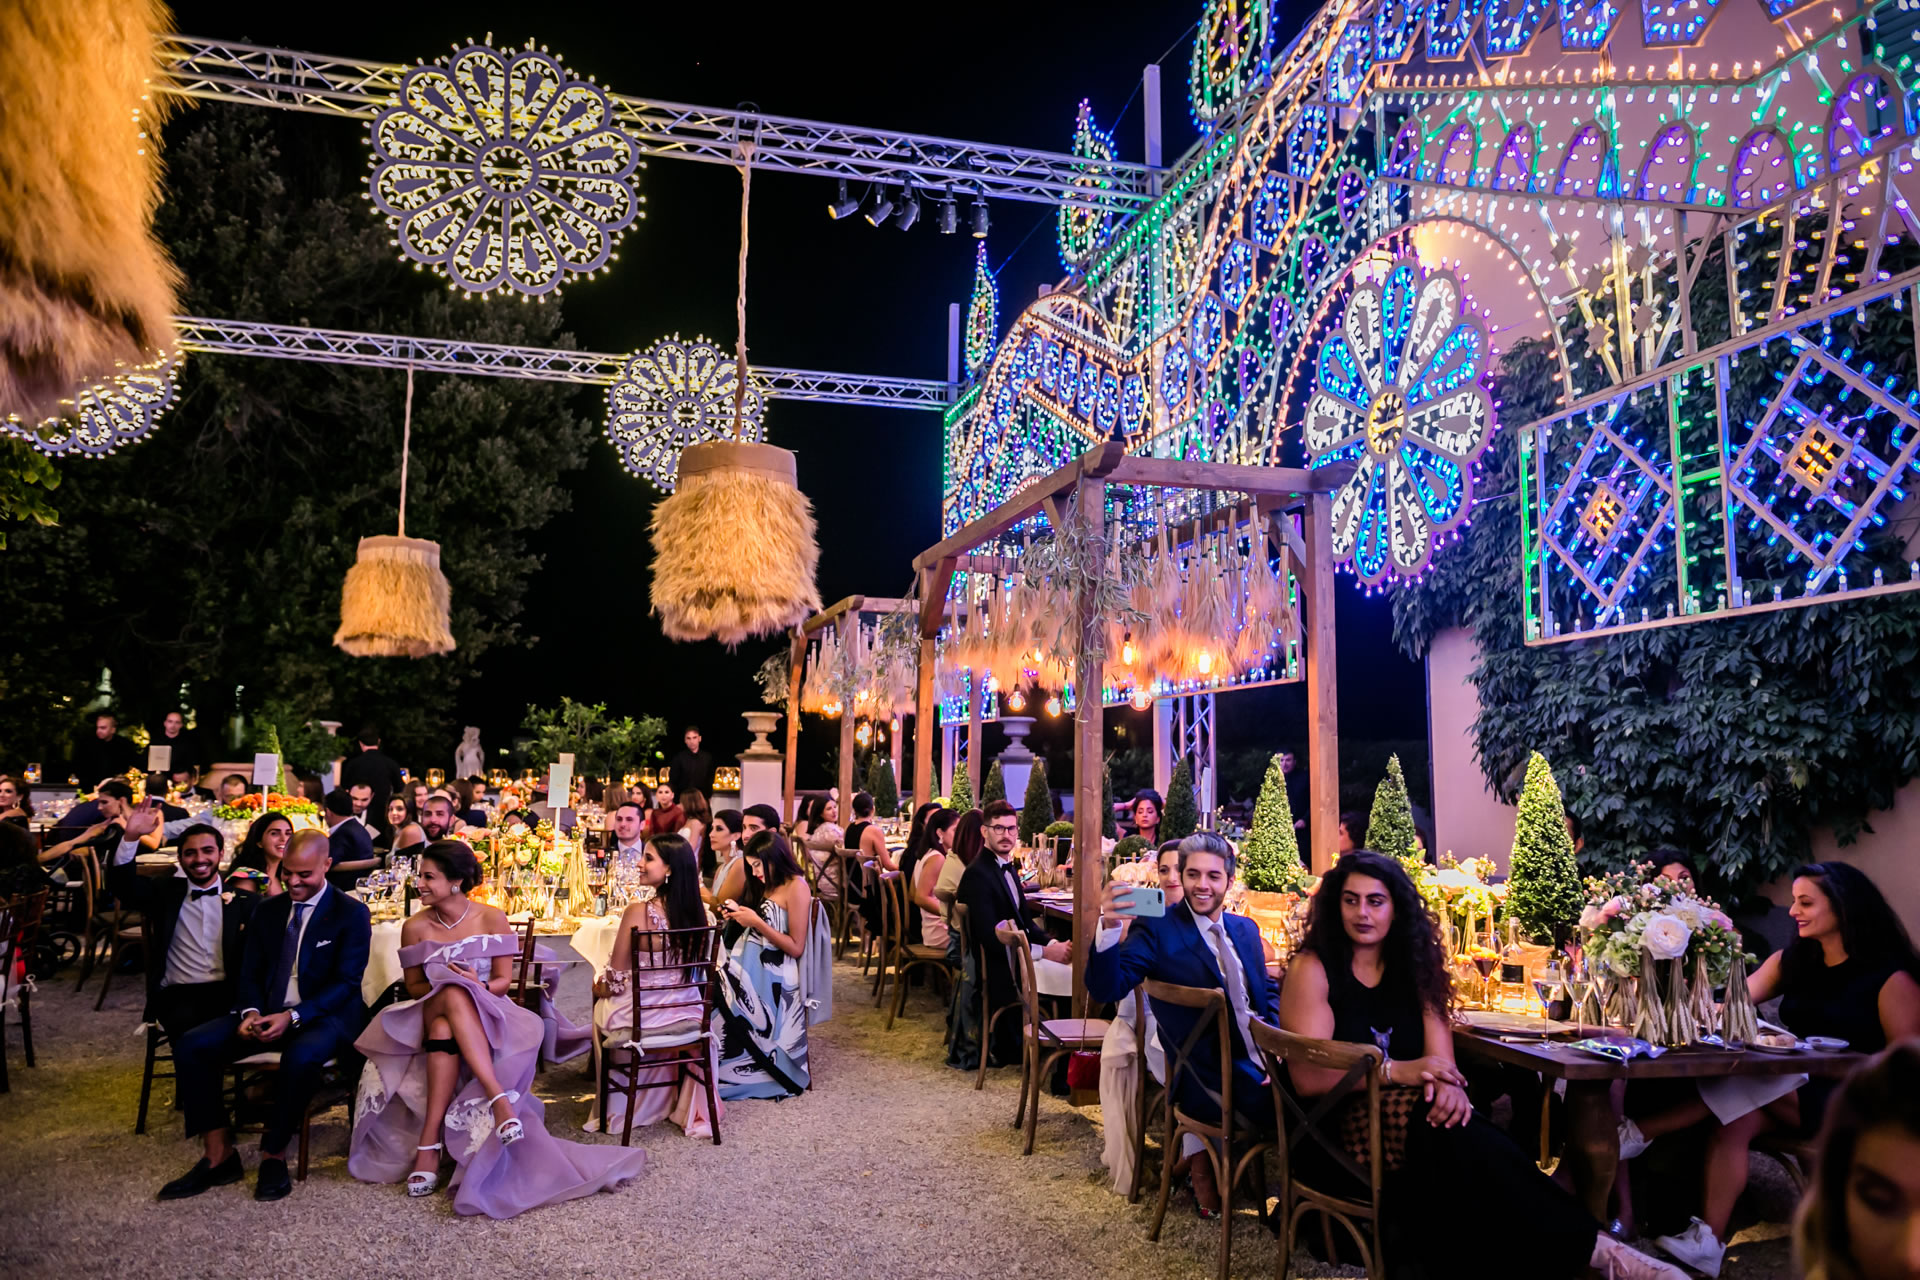 Event - 60 :: Luxury wedding at Il Borro :: Luxury wedding photography - 59 :: Event - 60